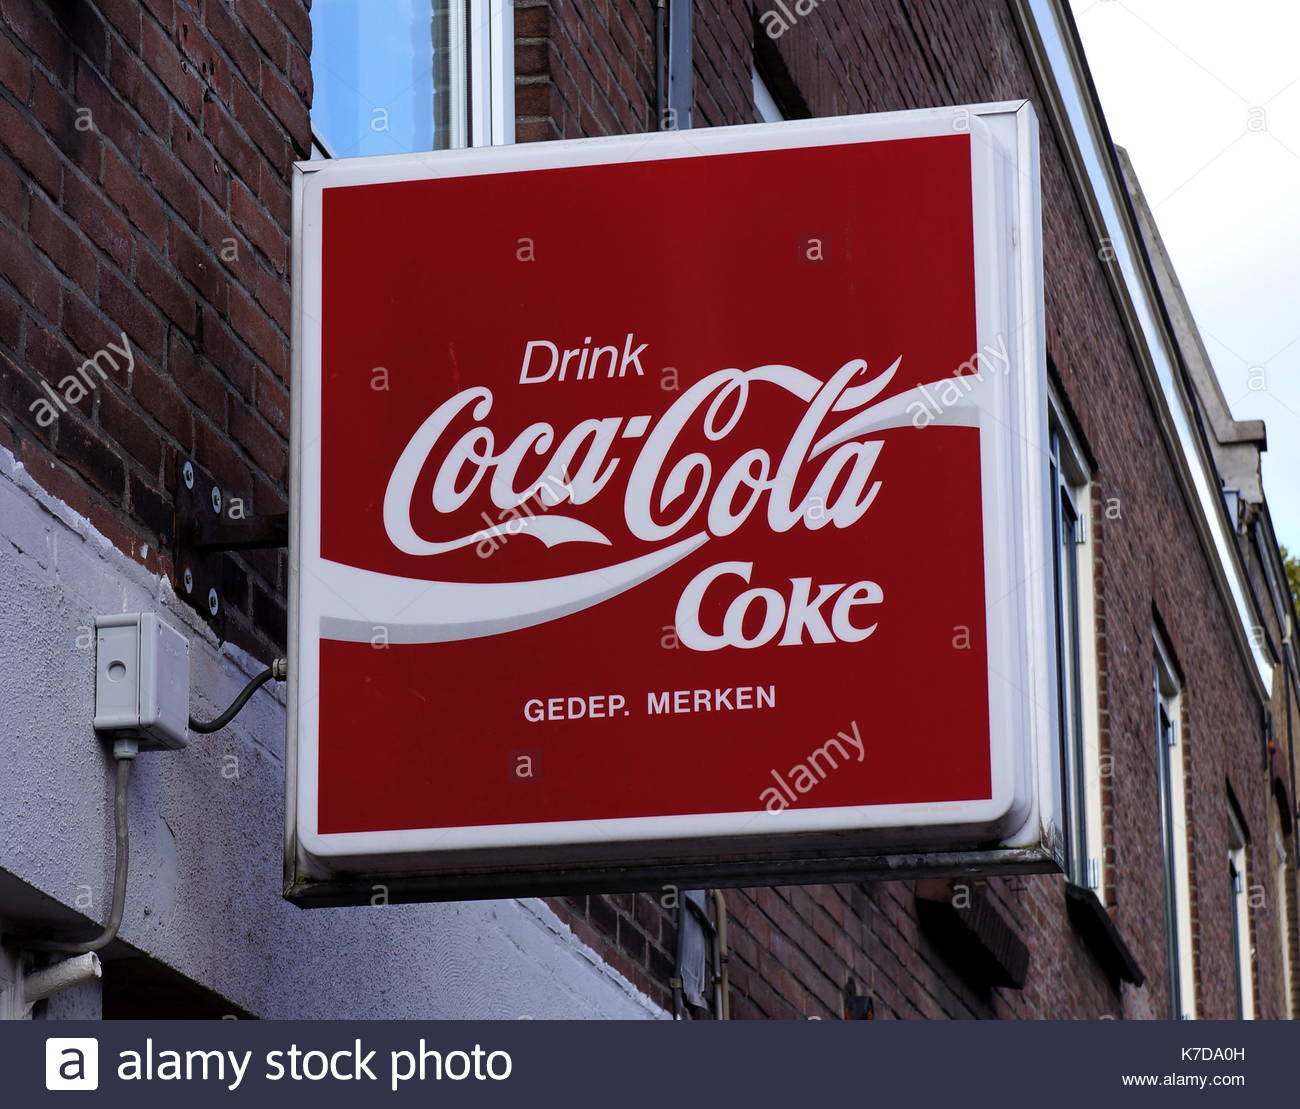 analysis coca cola advertising Swot analysis of coca-cola company coca-cola has the heavy advertising and promoting activities coca-cola swot analysis coca-cola company swot analysis.